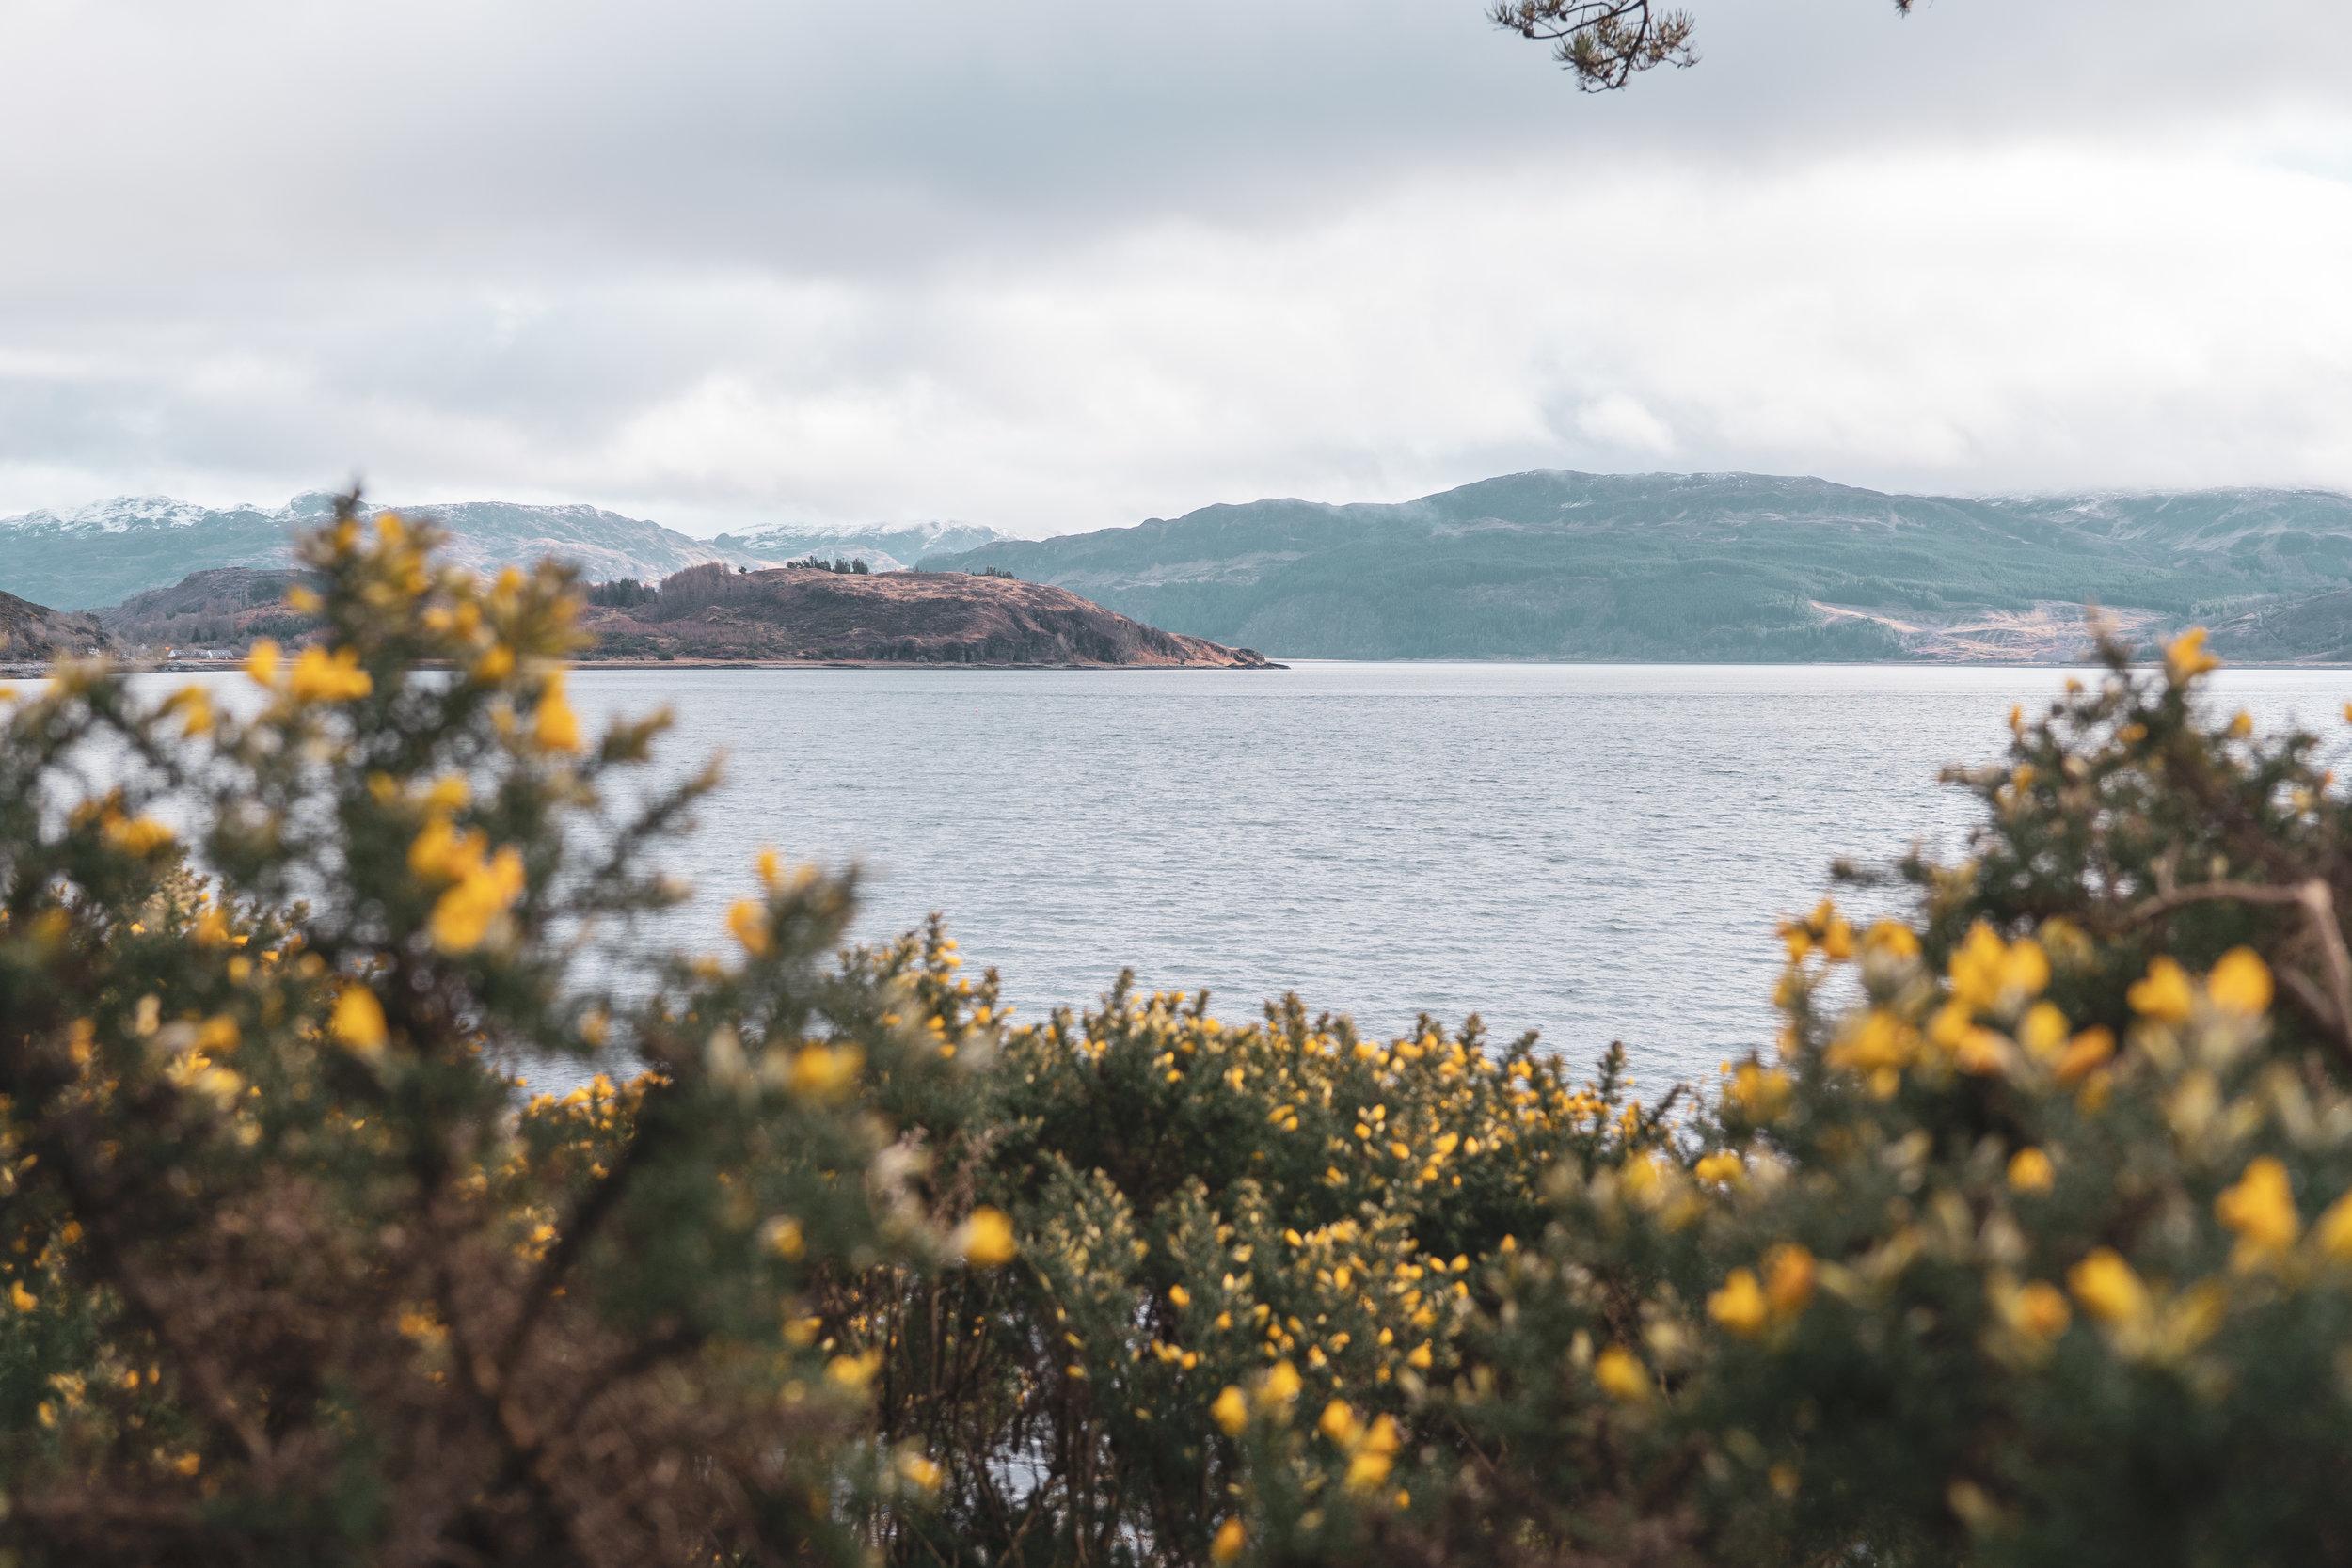 Isle-of-Skye-Eilean-Donan (18).jpg